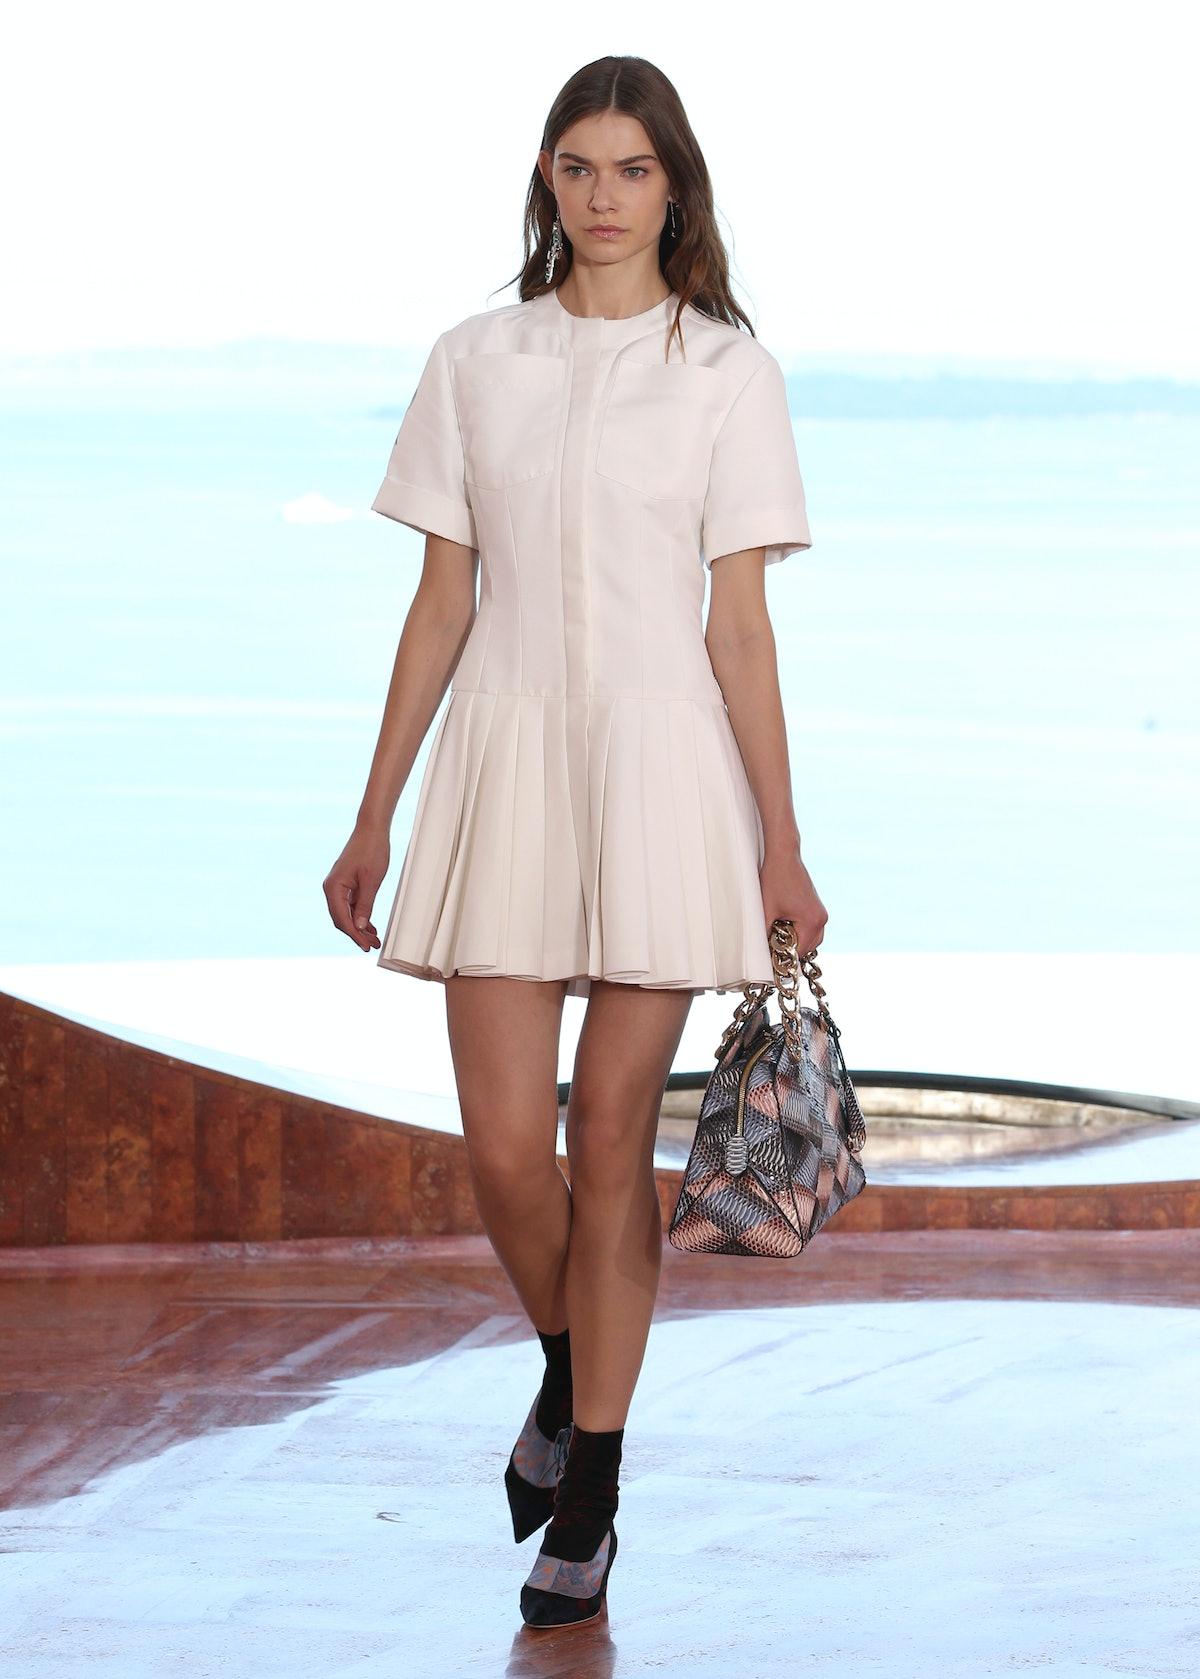 Dior Cruise 2016